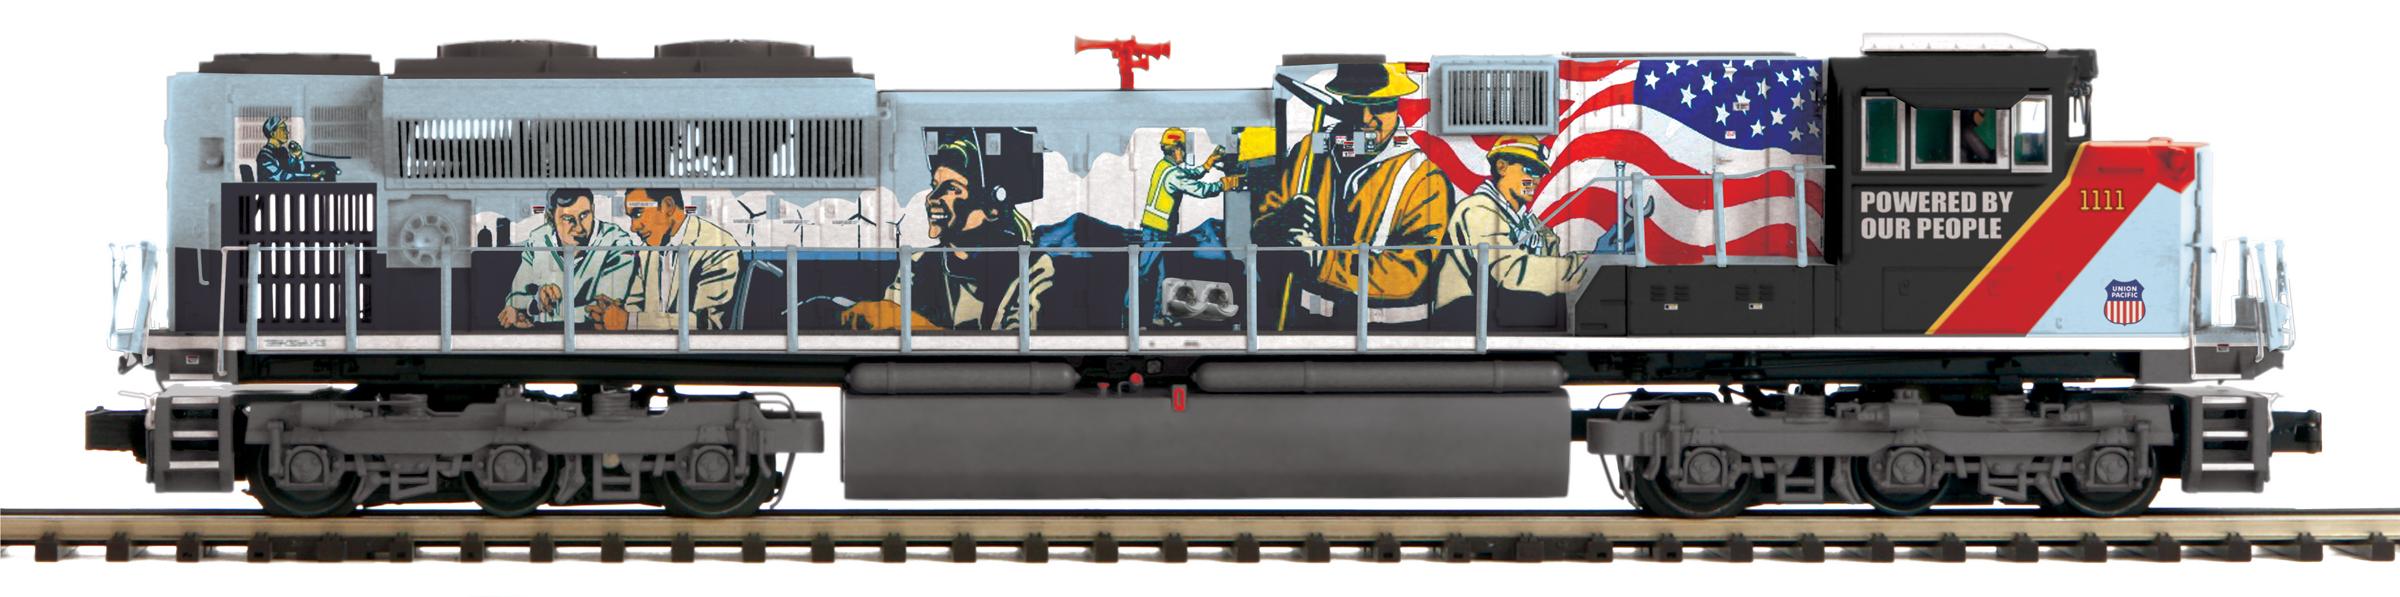 MTH 20-21264-1 O EMD SD70ACe 3 Rail Hi Rail Wheels Proto Sound 3.0 Union Pacific 1111